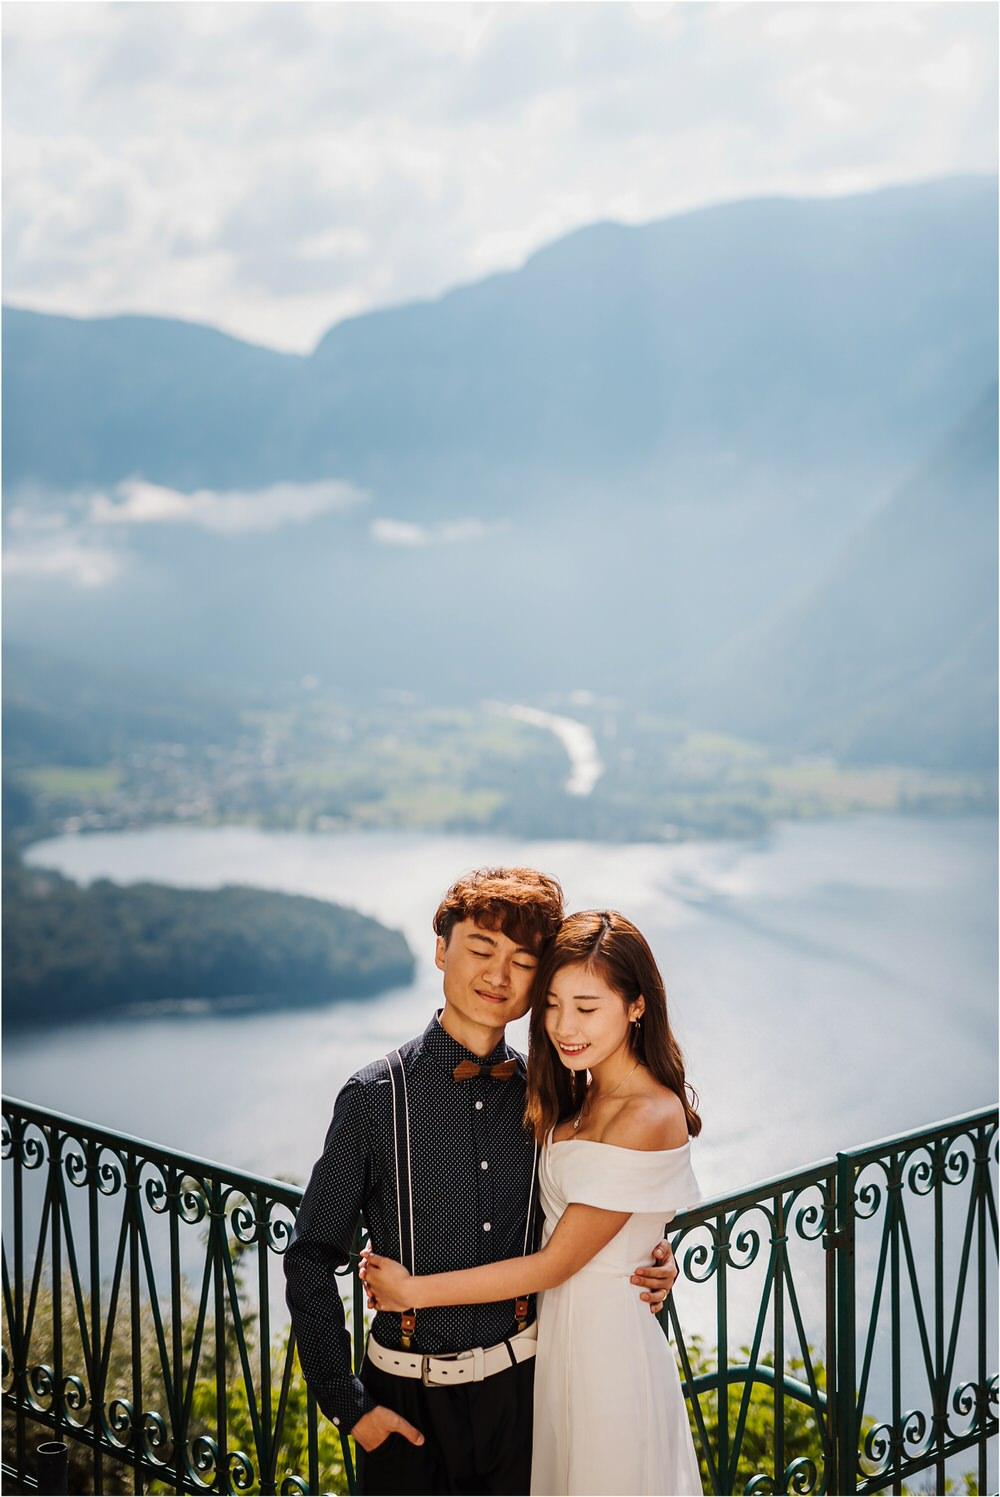 hallstatt austria wedding engagement photographer asian proposal surprise photography recommended nature professional 0069.jpg